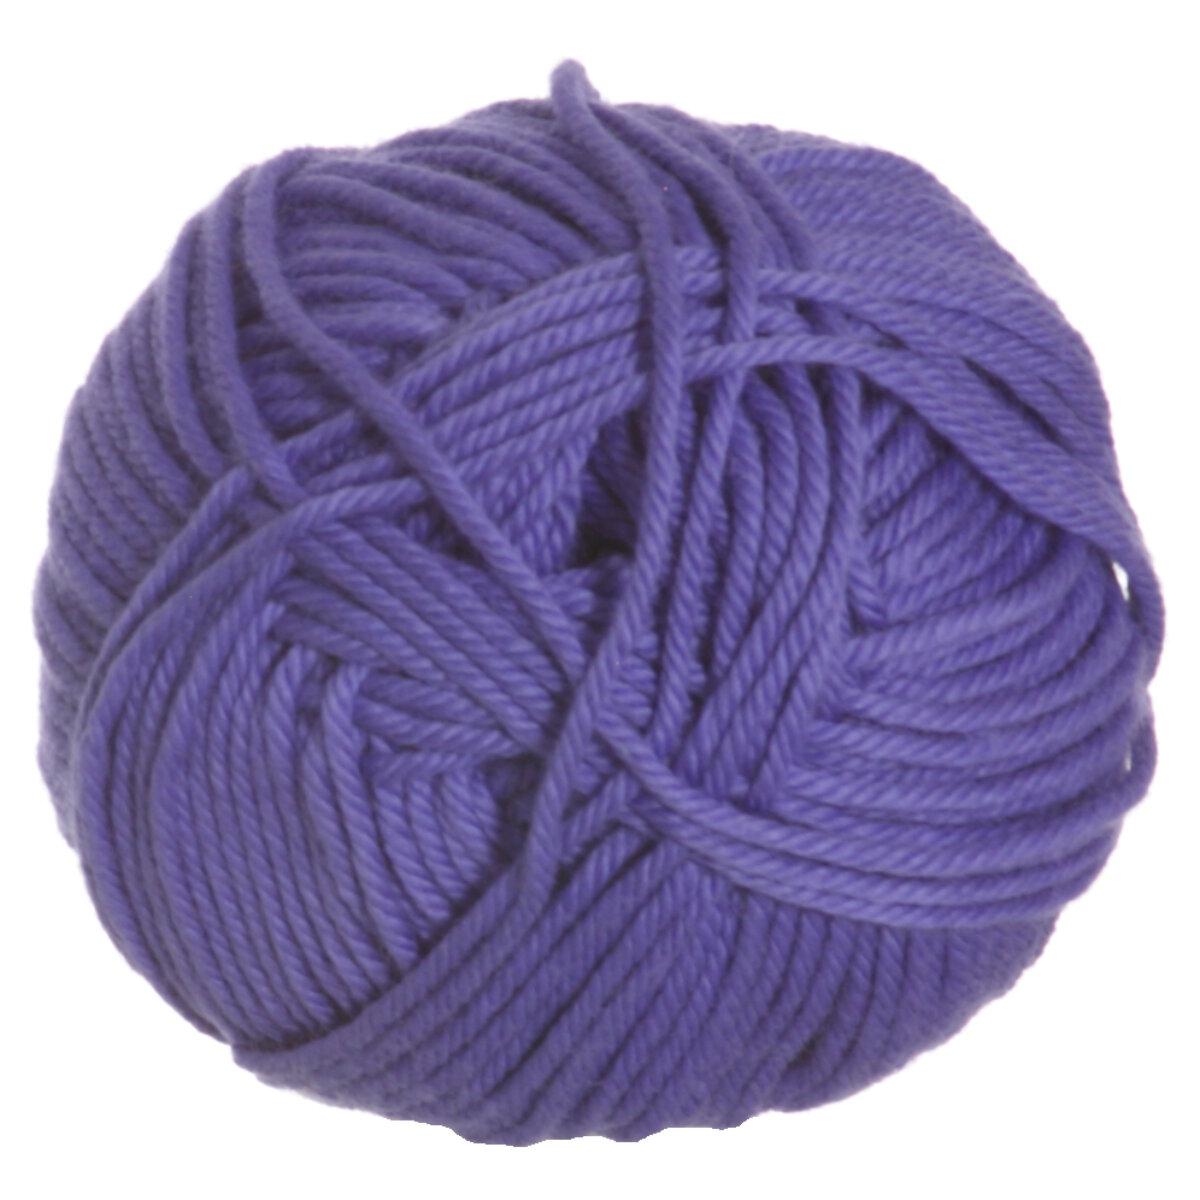 Knitting Patterns Rowan Wool Cotton : Rowan Handknit Cotton Yarn - 353 Violet at Jimmy Beans Wool